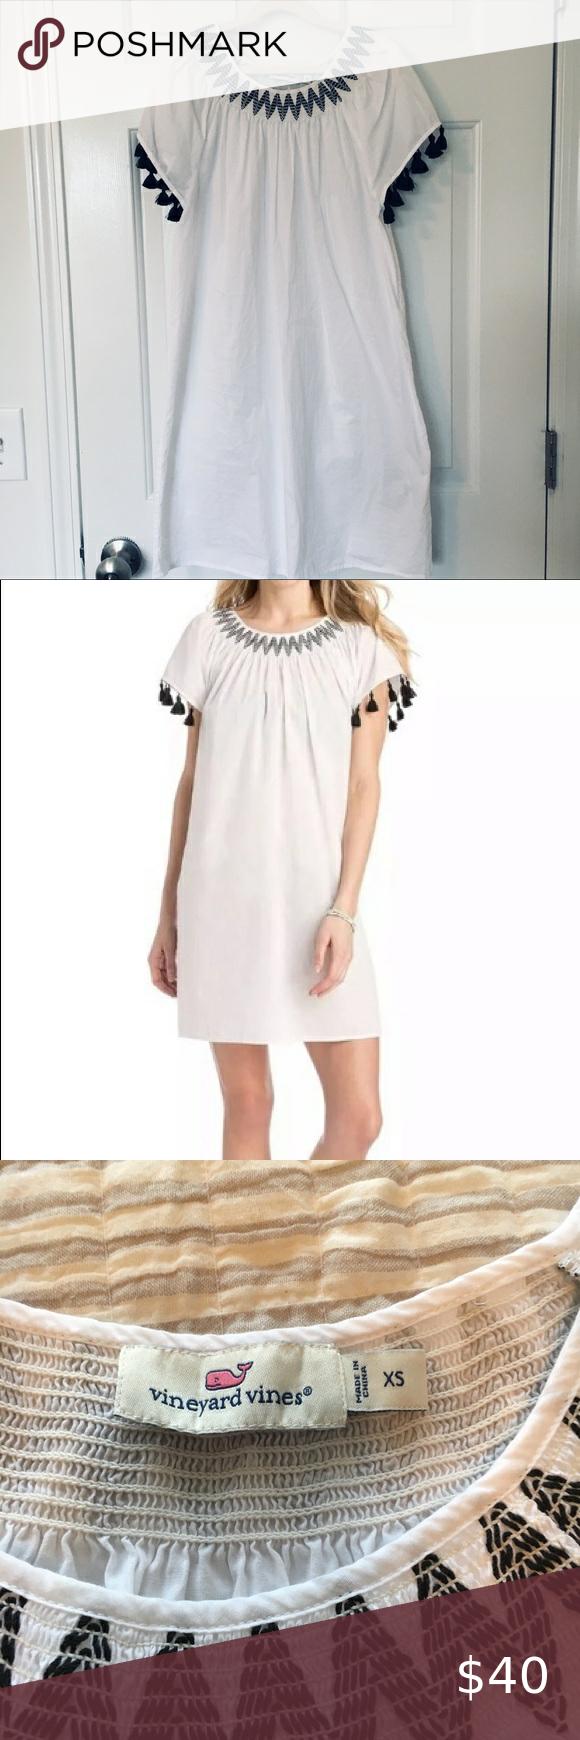 Vineyard Vines Smocked Tassel White Dress Xs In 2020 White Cotton Dress Dresses Xs White Dress [ 1740 x 580 Pixel ]